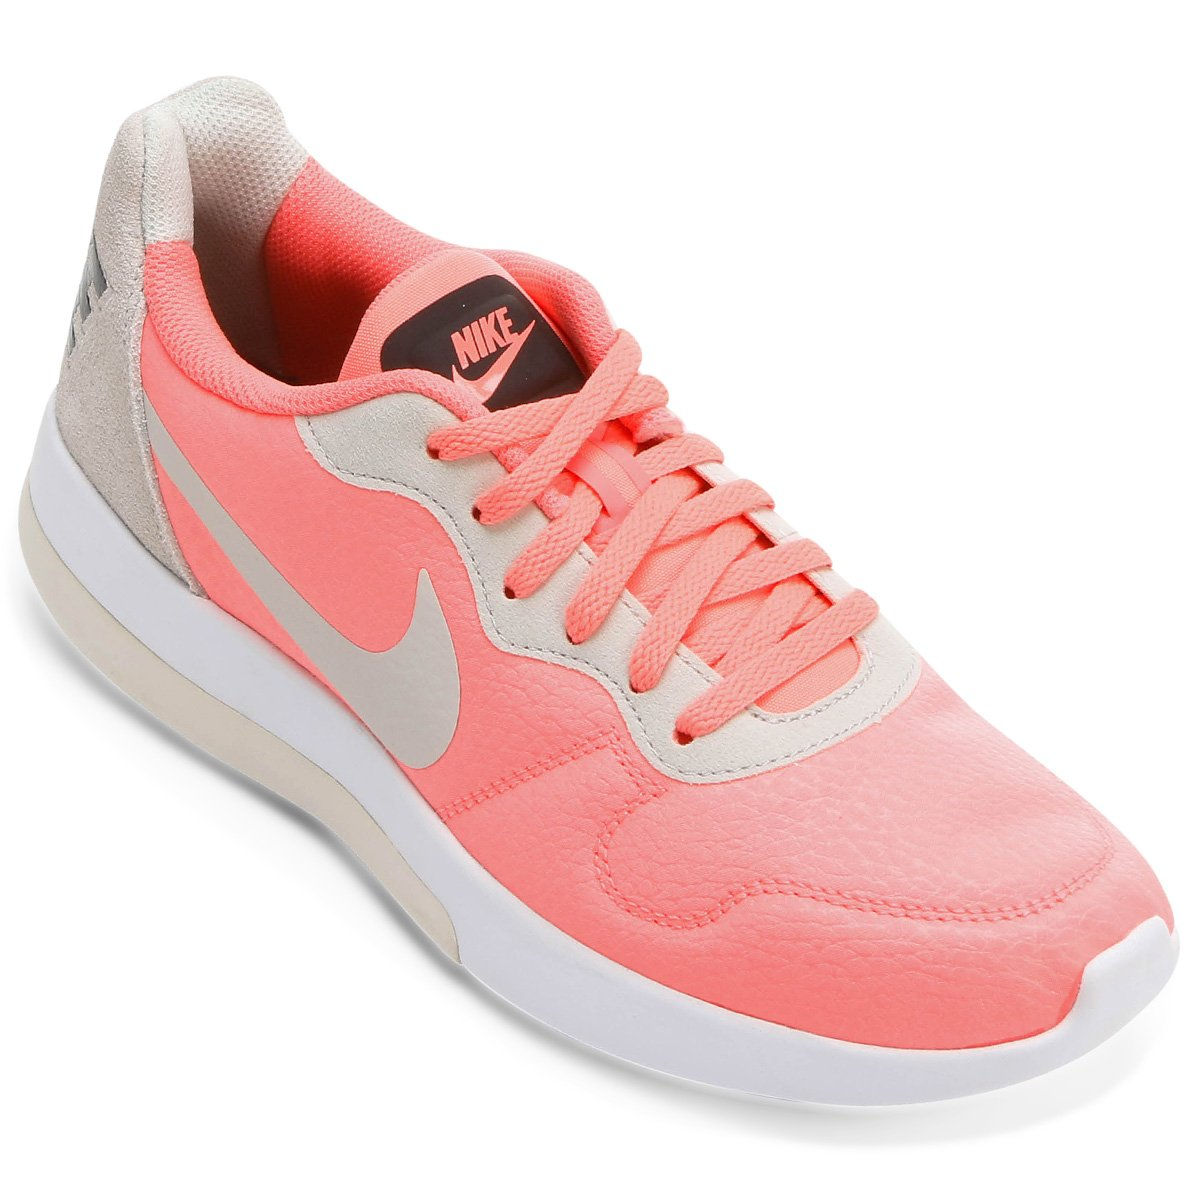 724ce455387 Tênis Nike Md Runner 2 Lw - Compre Agora